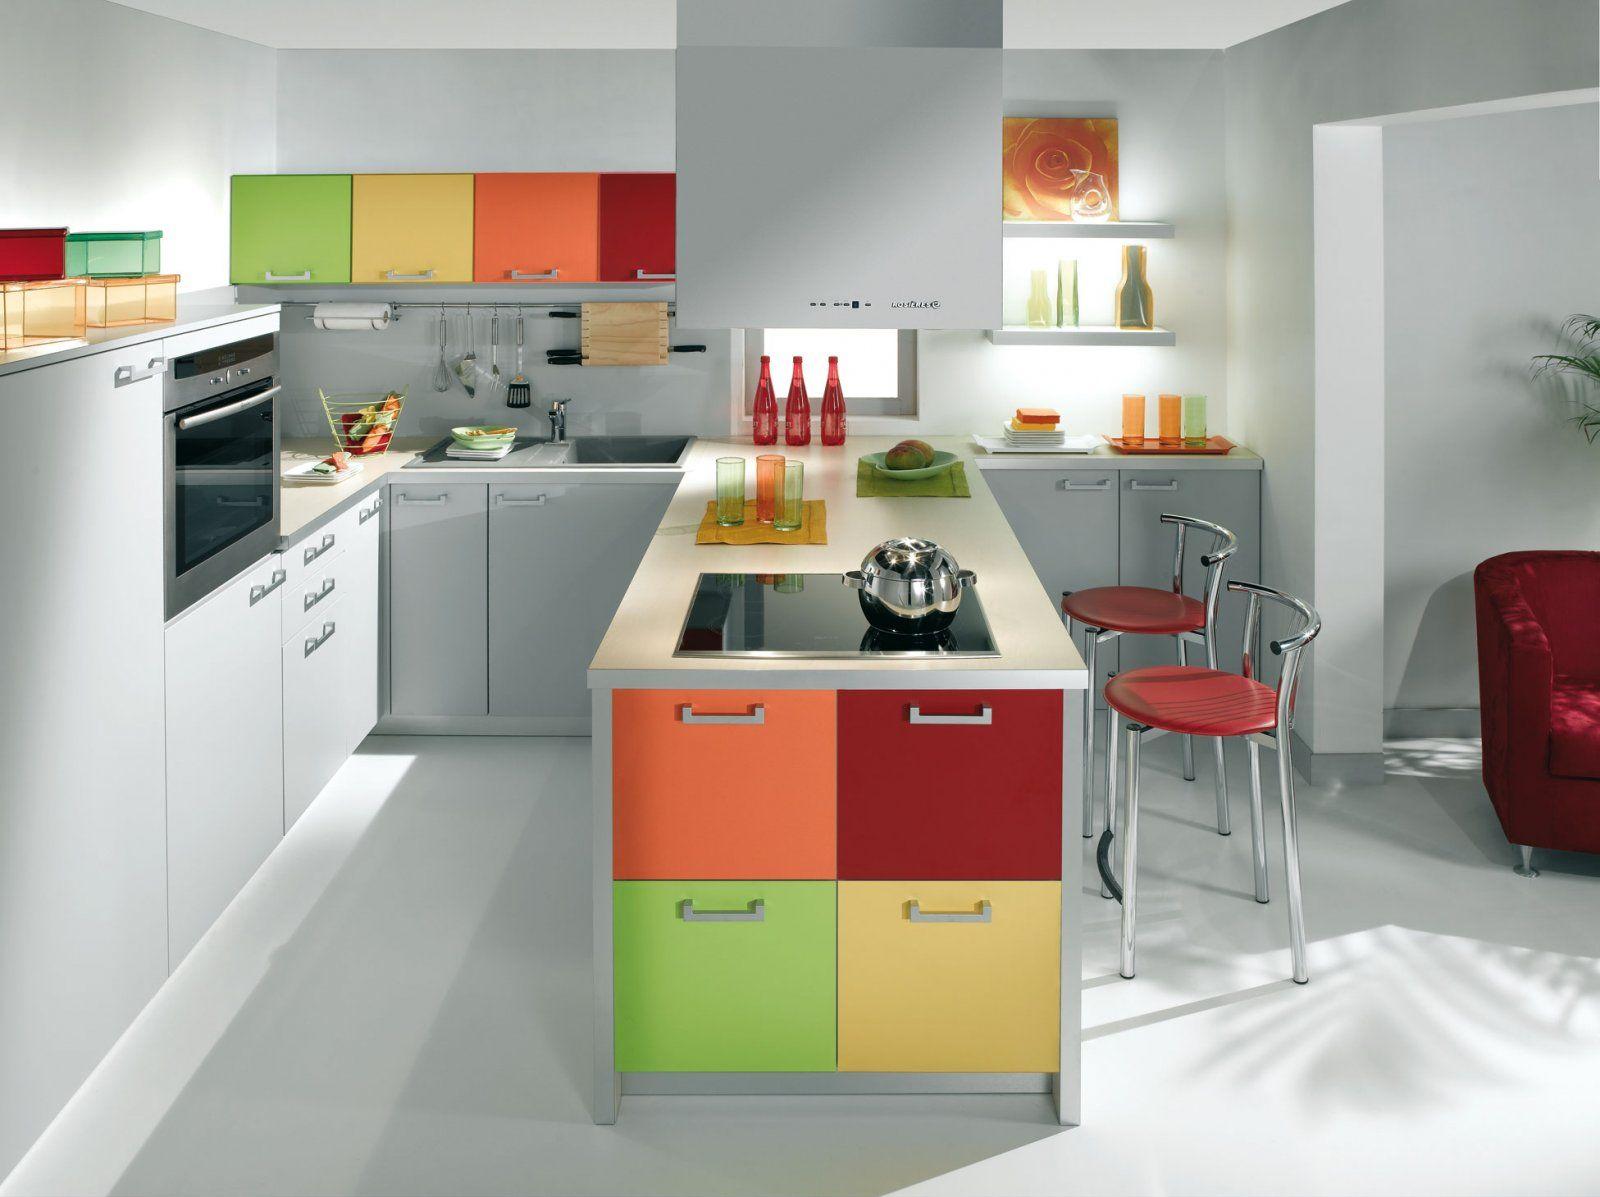 Cocinas coloridas | Decoracion de Interiores | Cocina | Pinterest ...